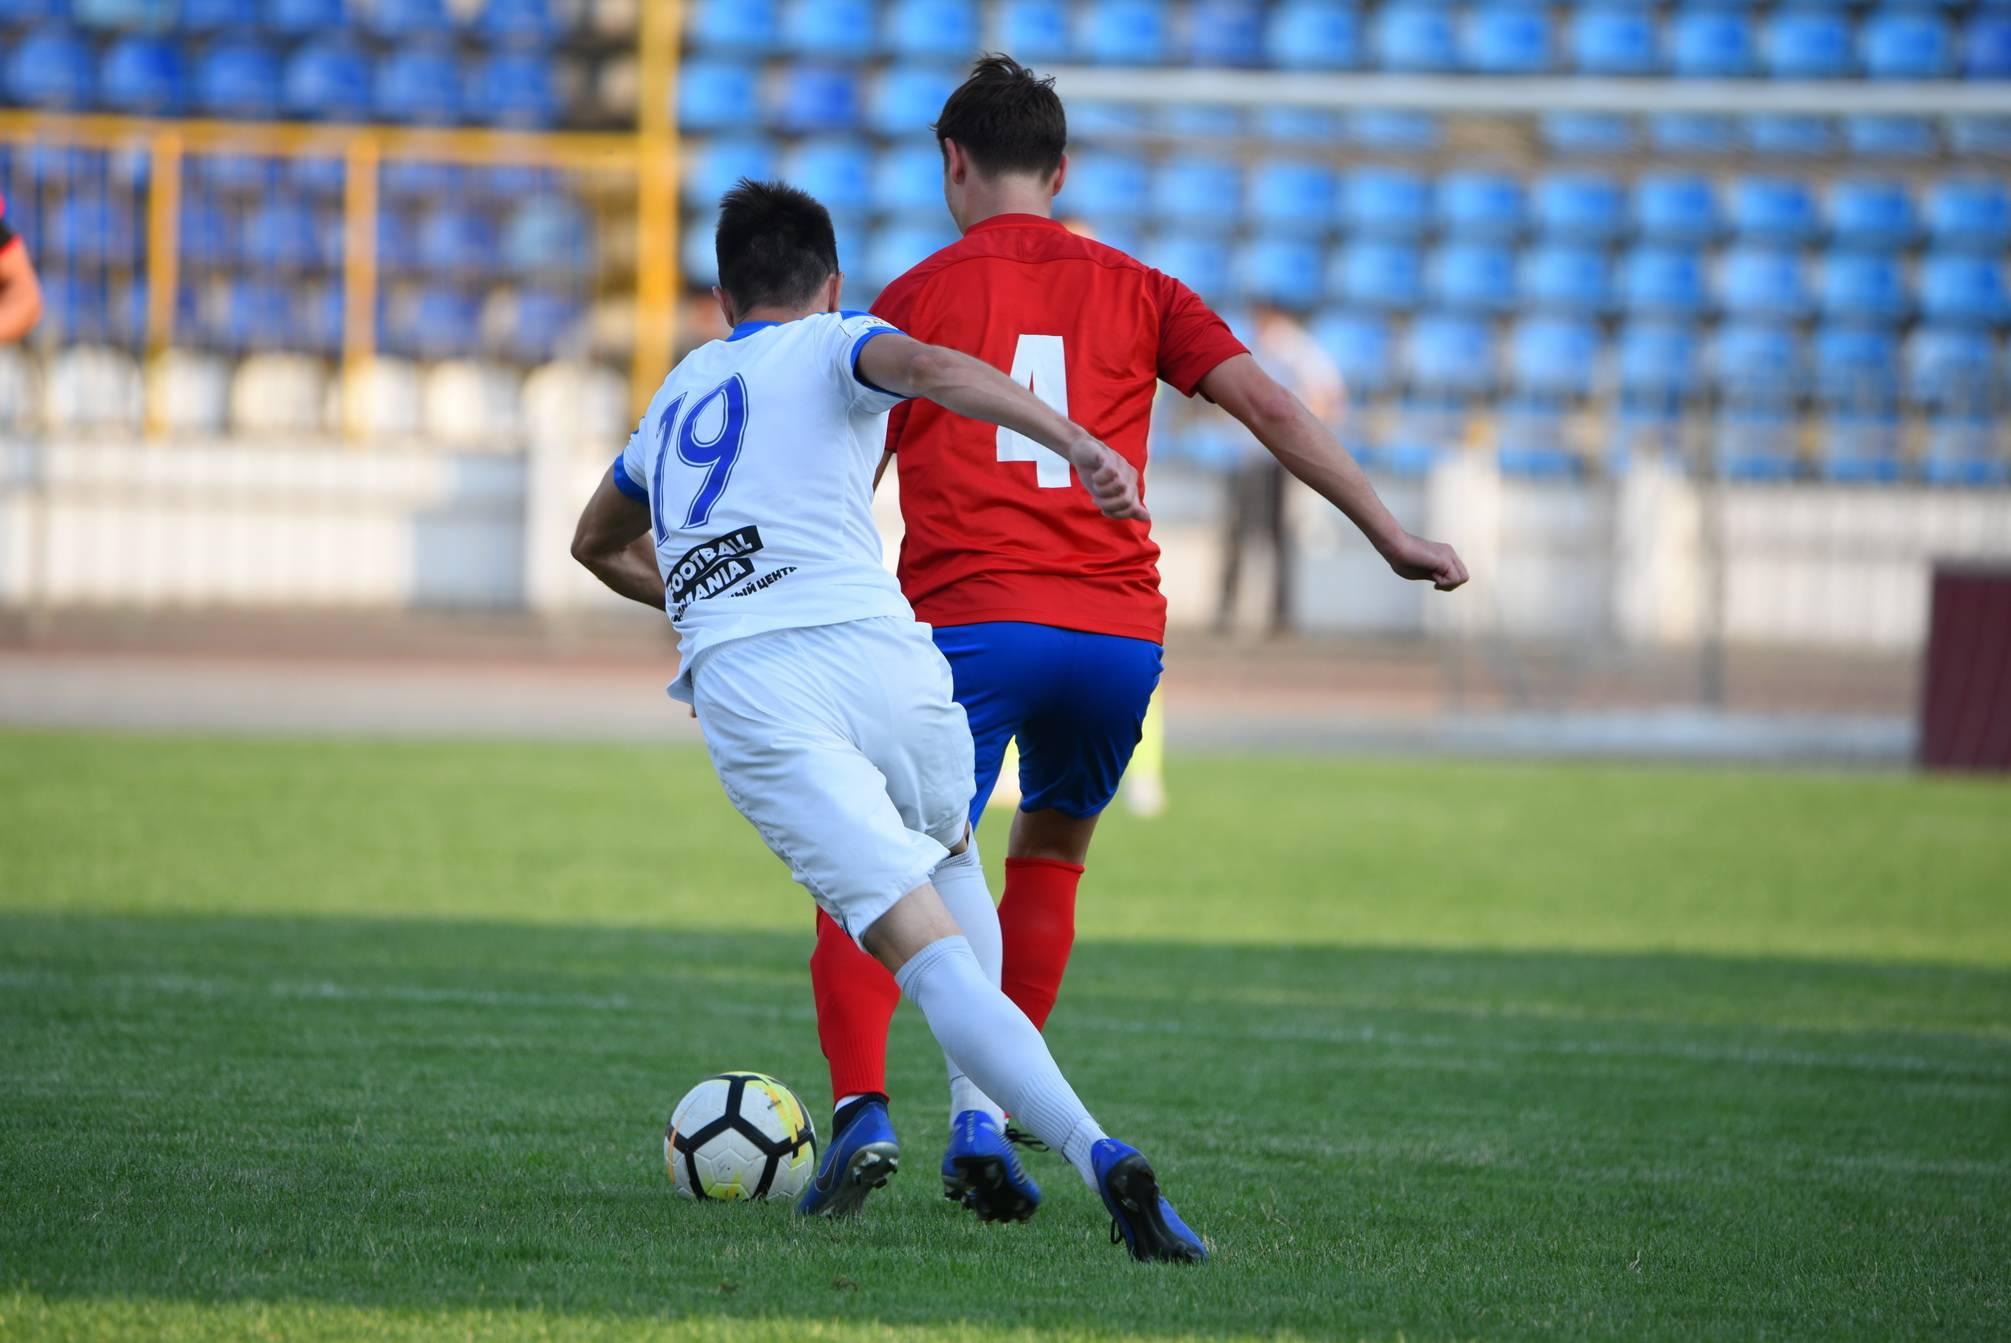 Победить помог хет-трик новороссийского футболиста